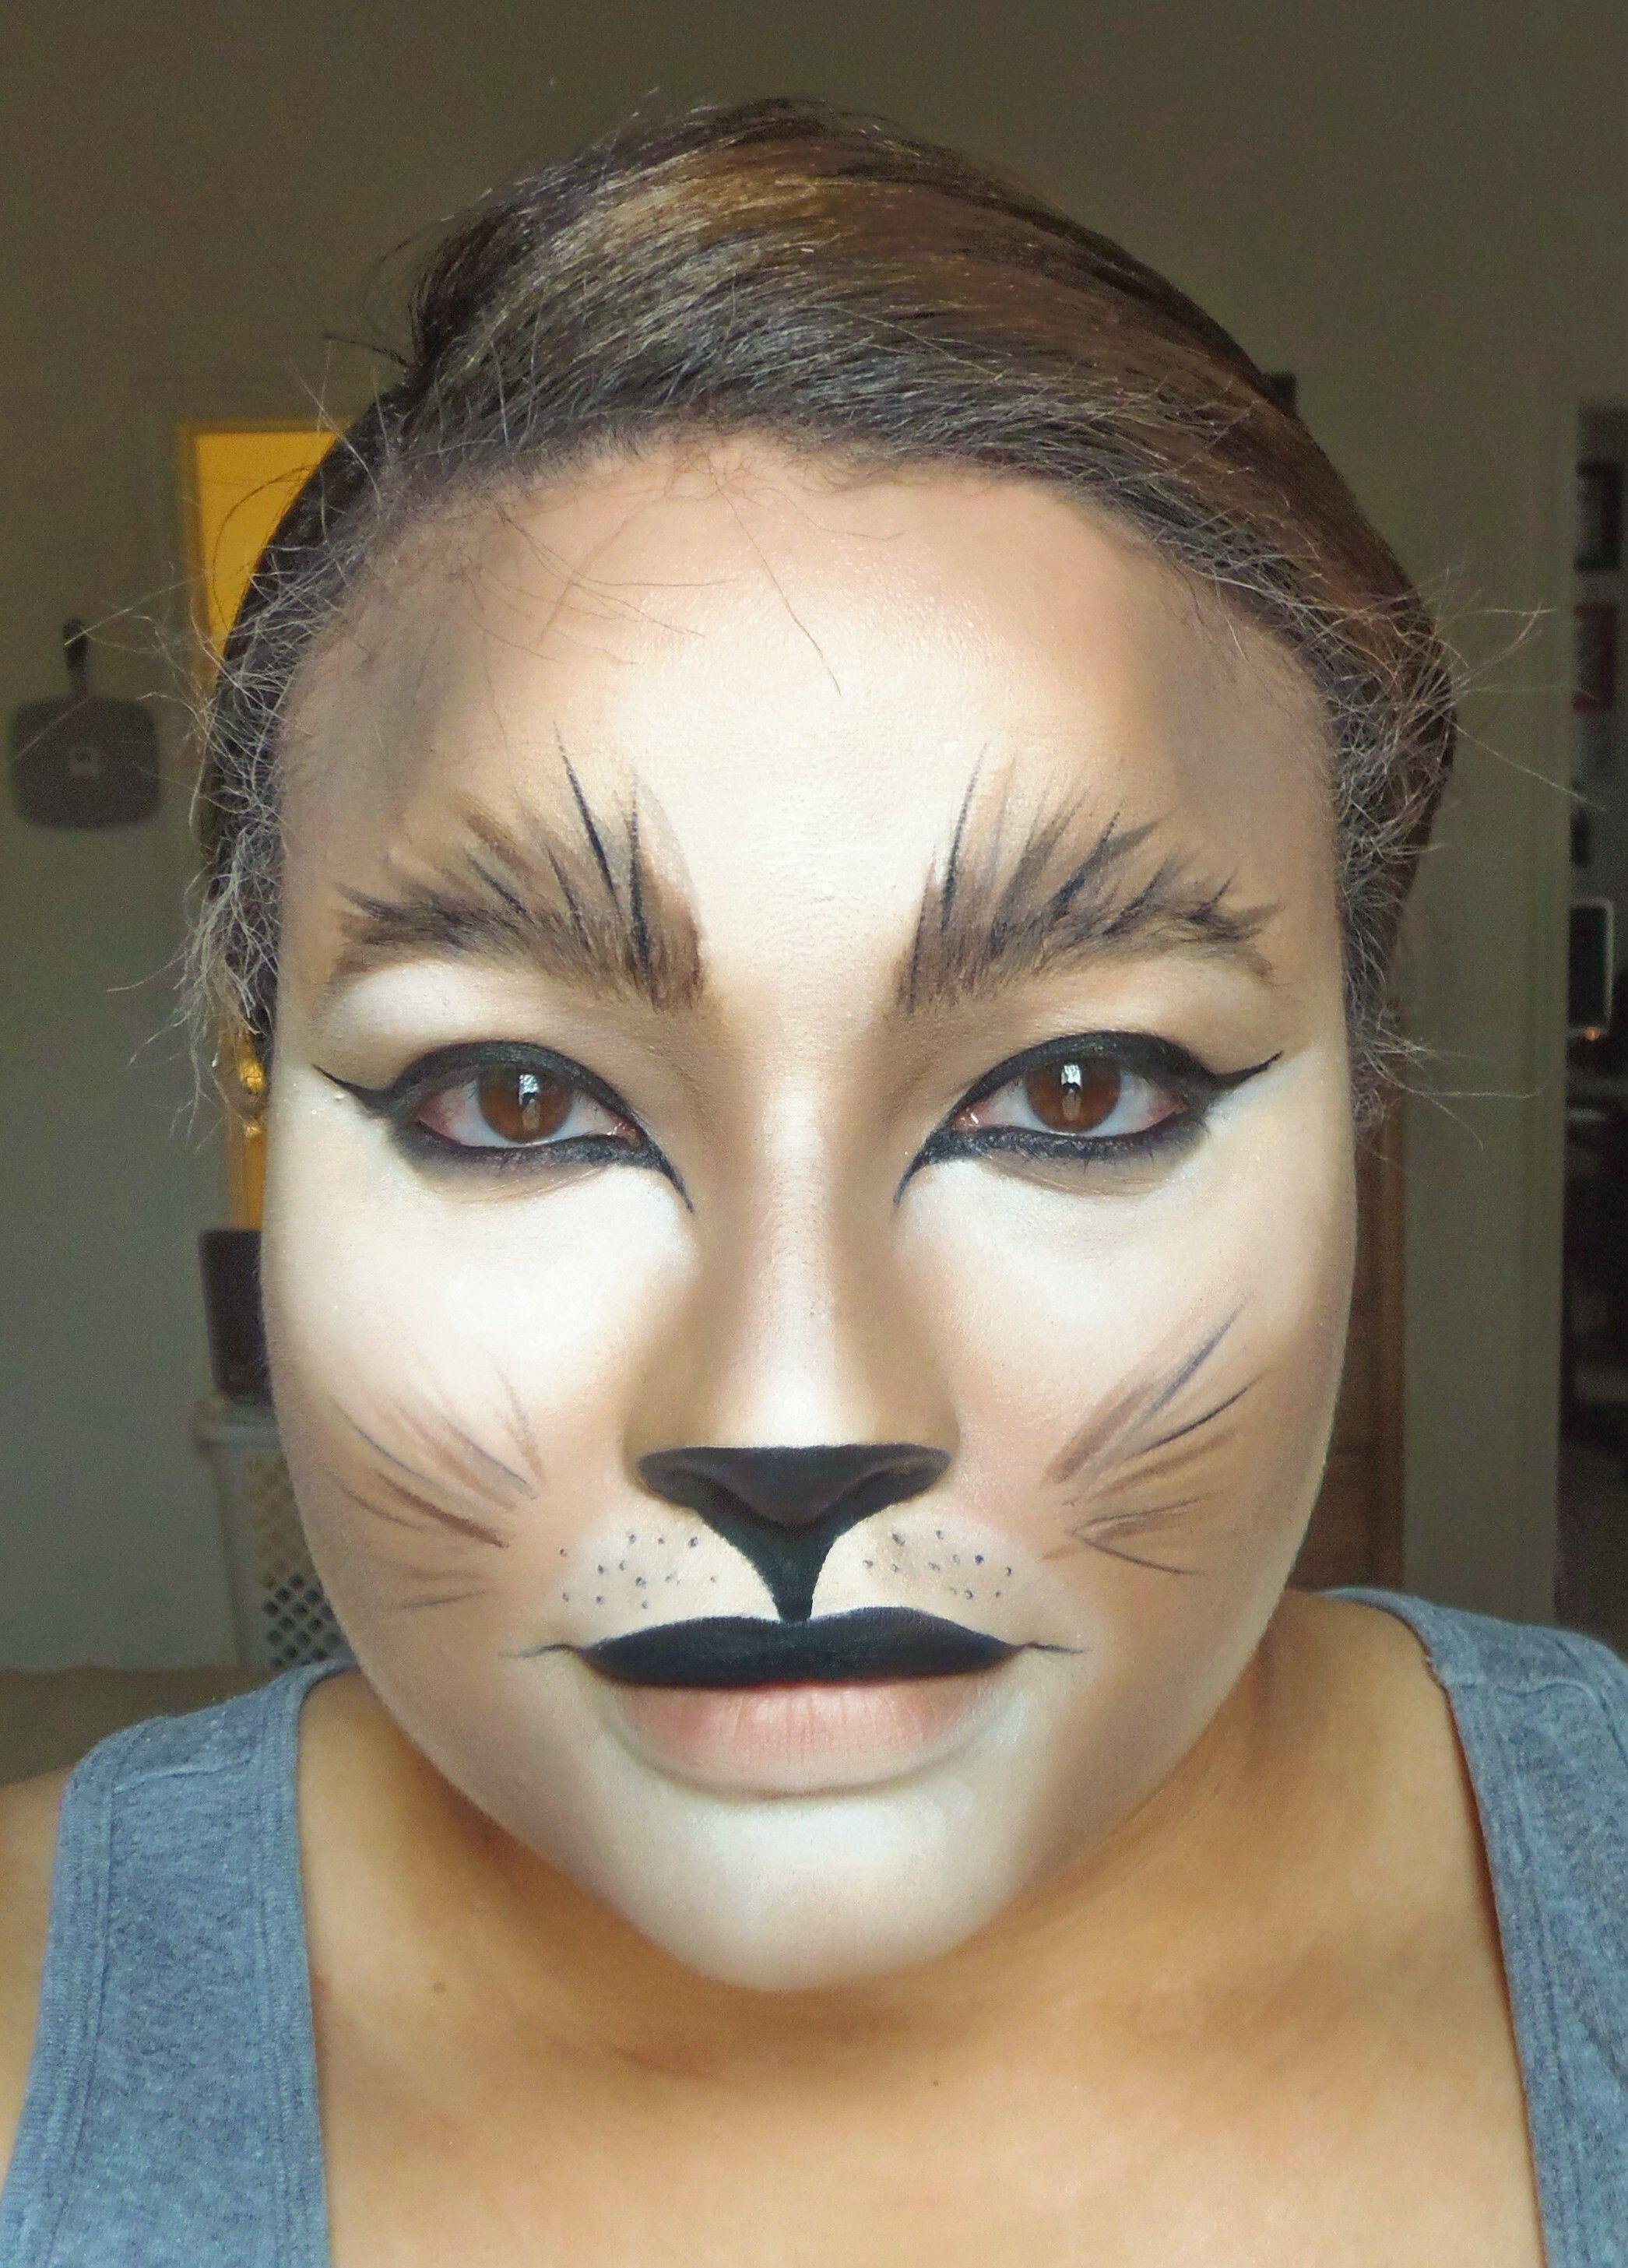 costume makeup alert lionesscat halloween makeup - Halloween Makeup For Cat Face